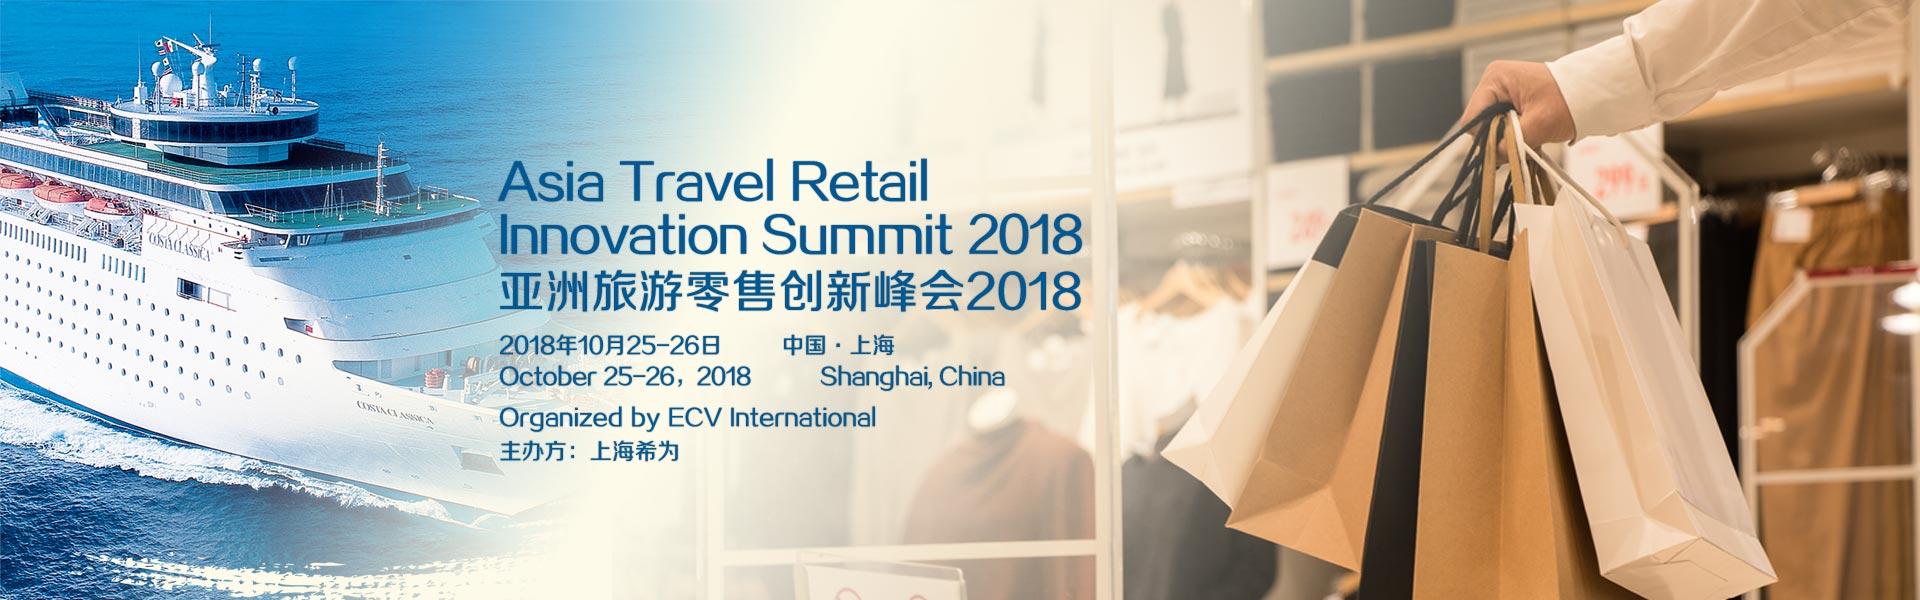 China Travel Retail Innovation Summit 2018